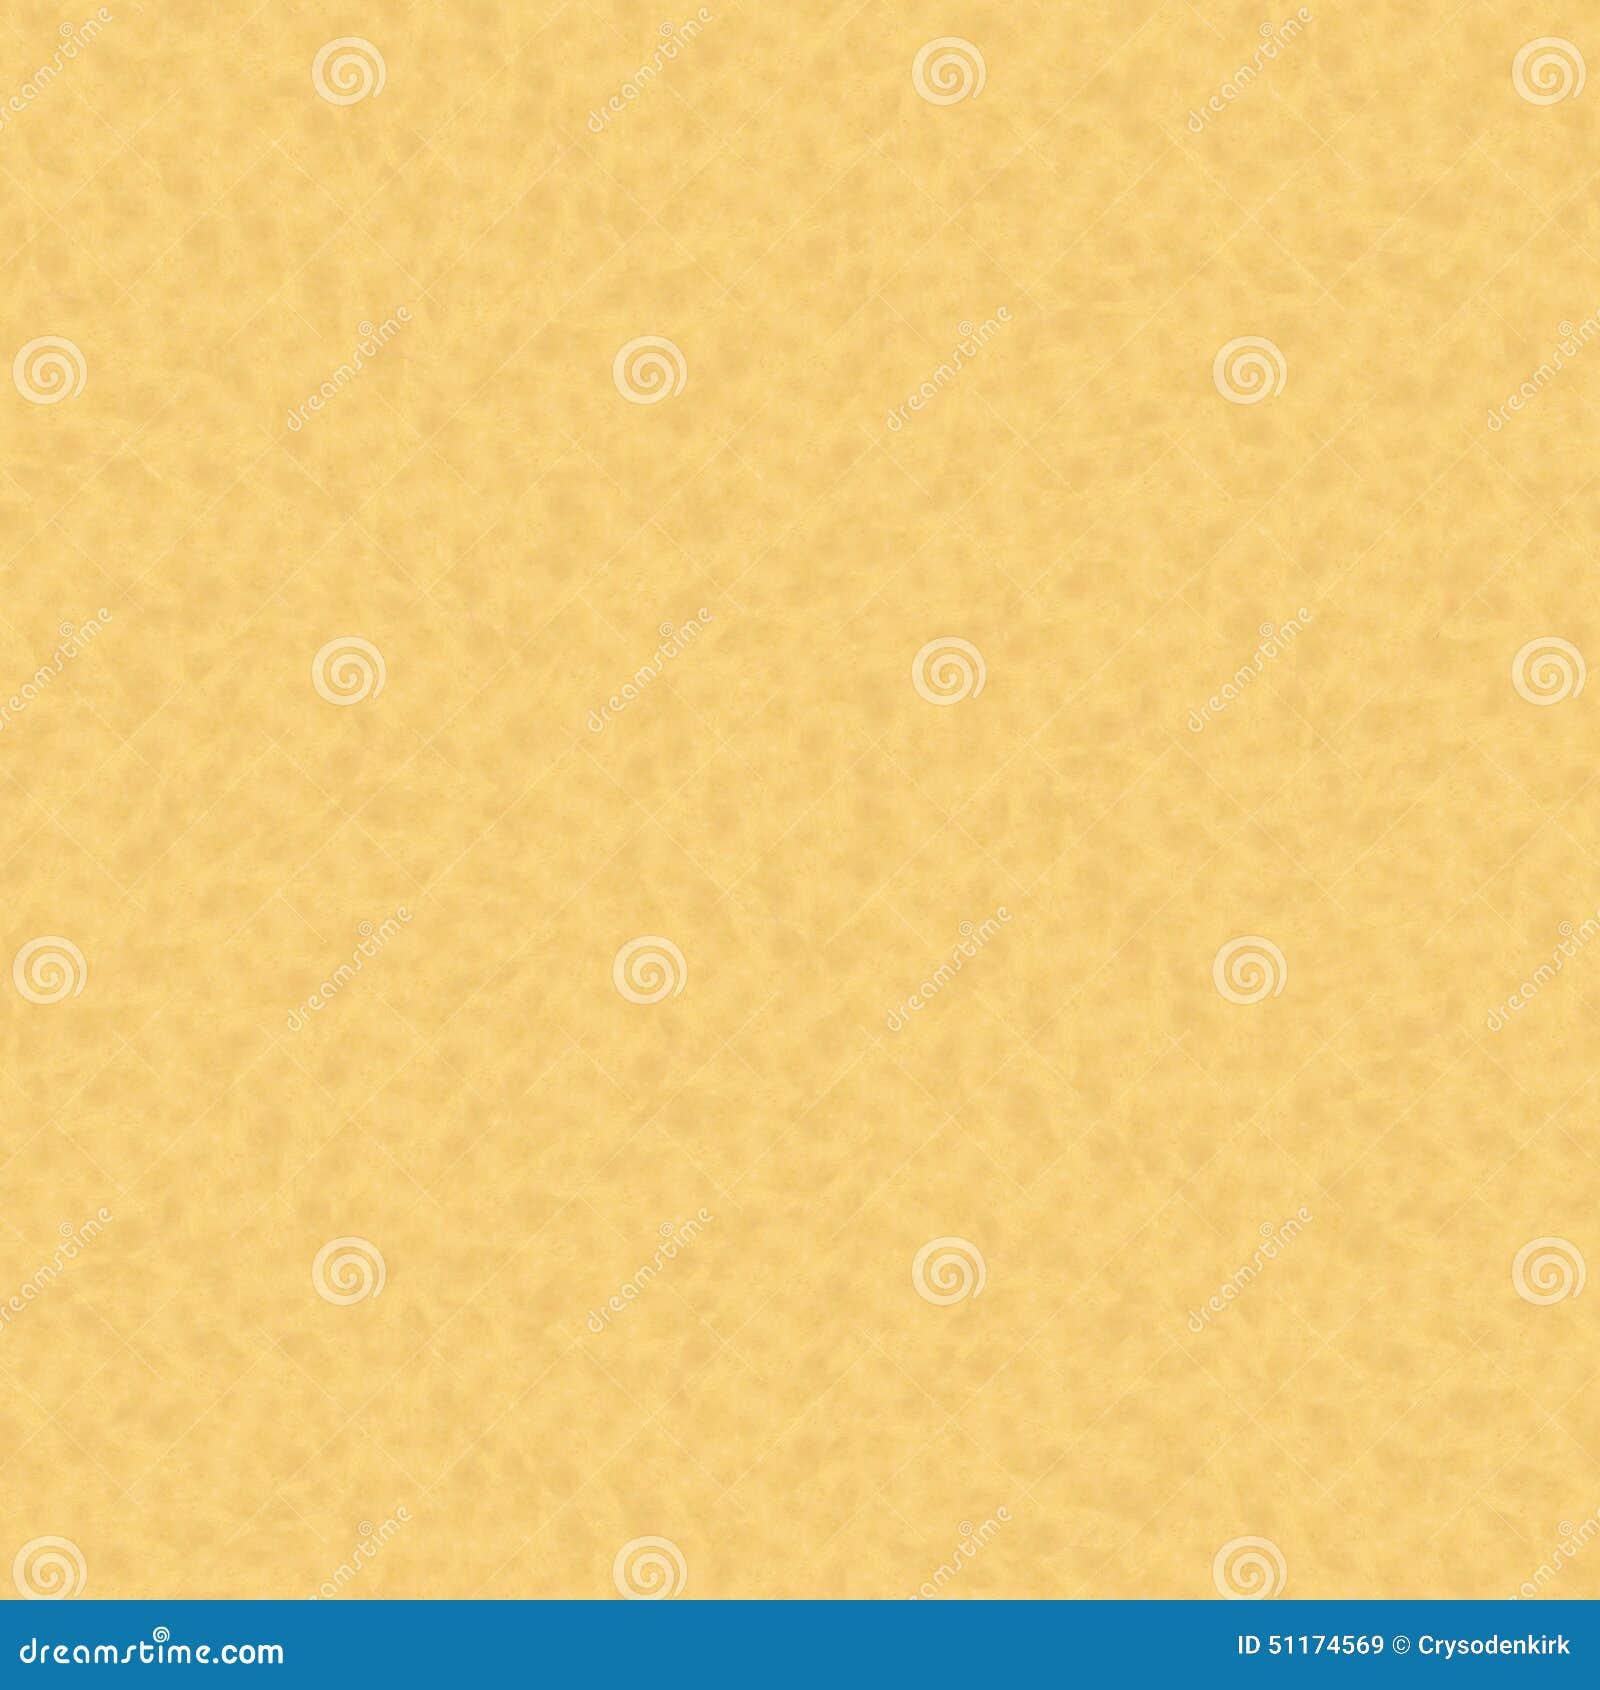 Vellum Seamless Tile Texture Background